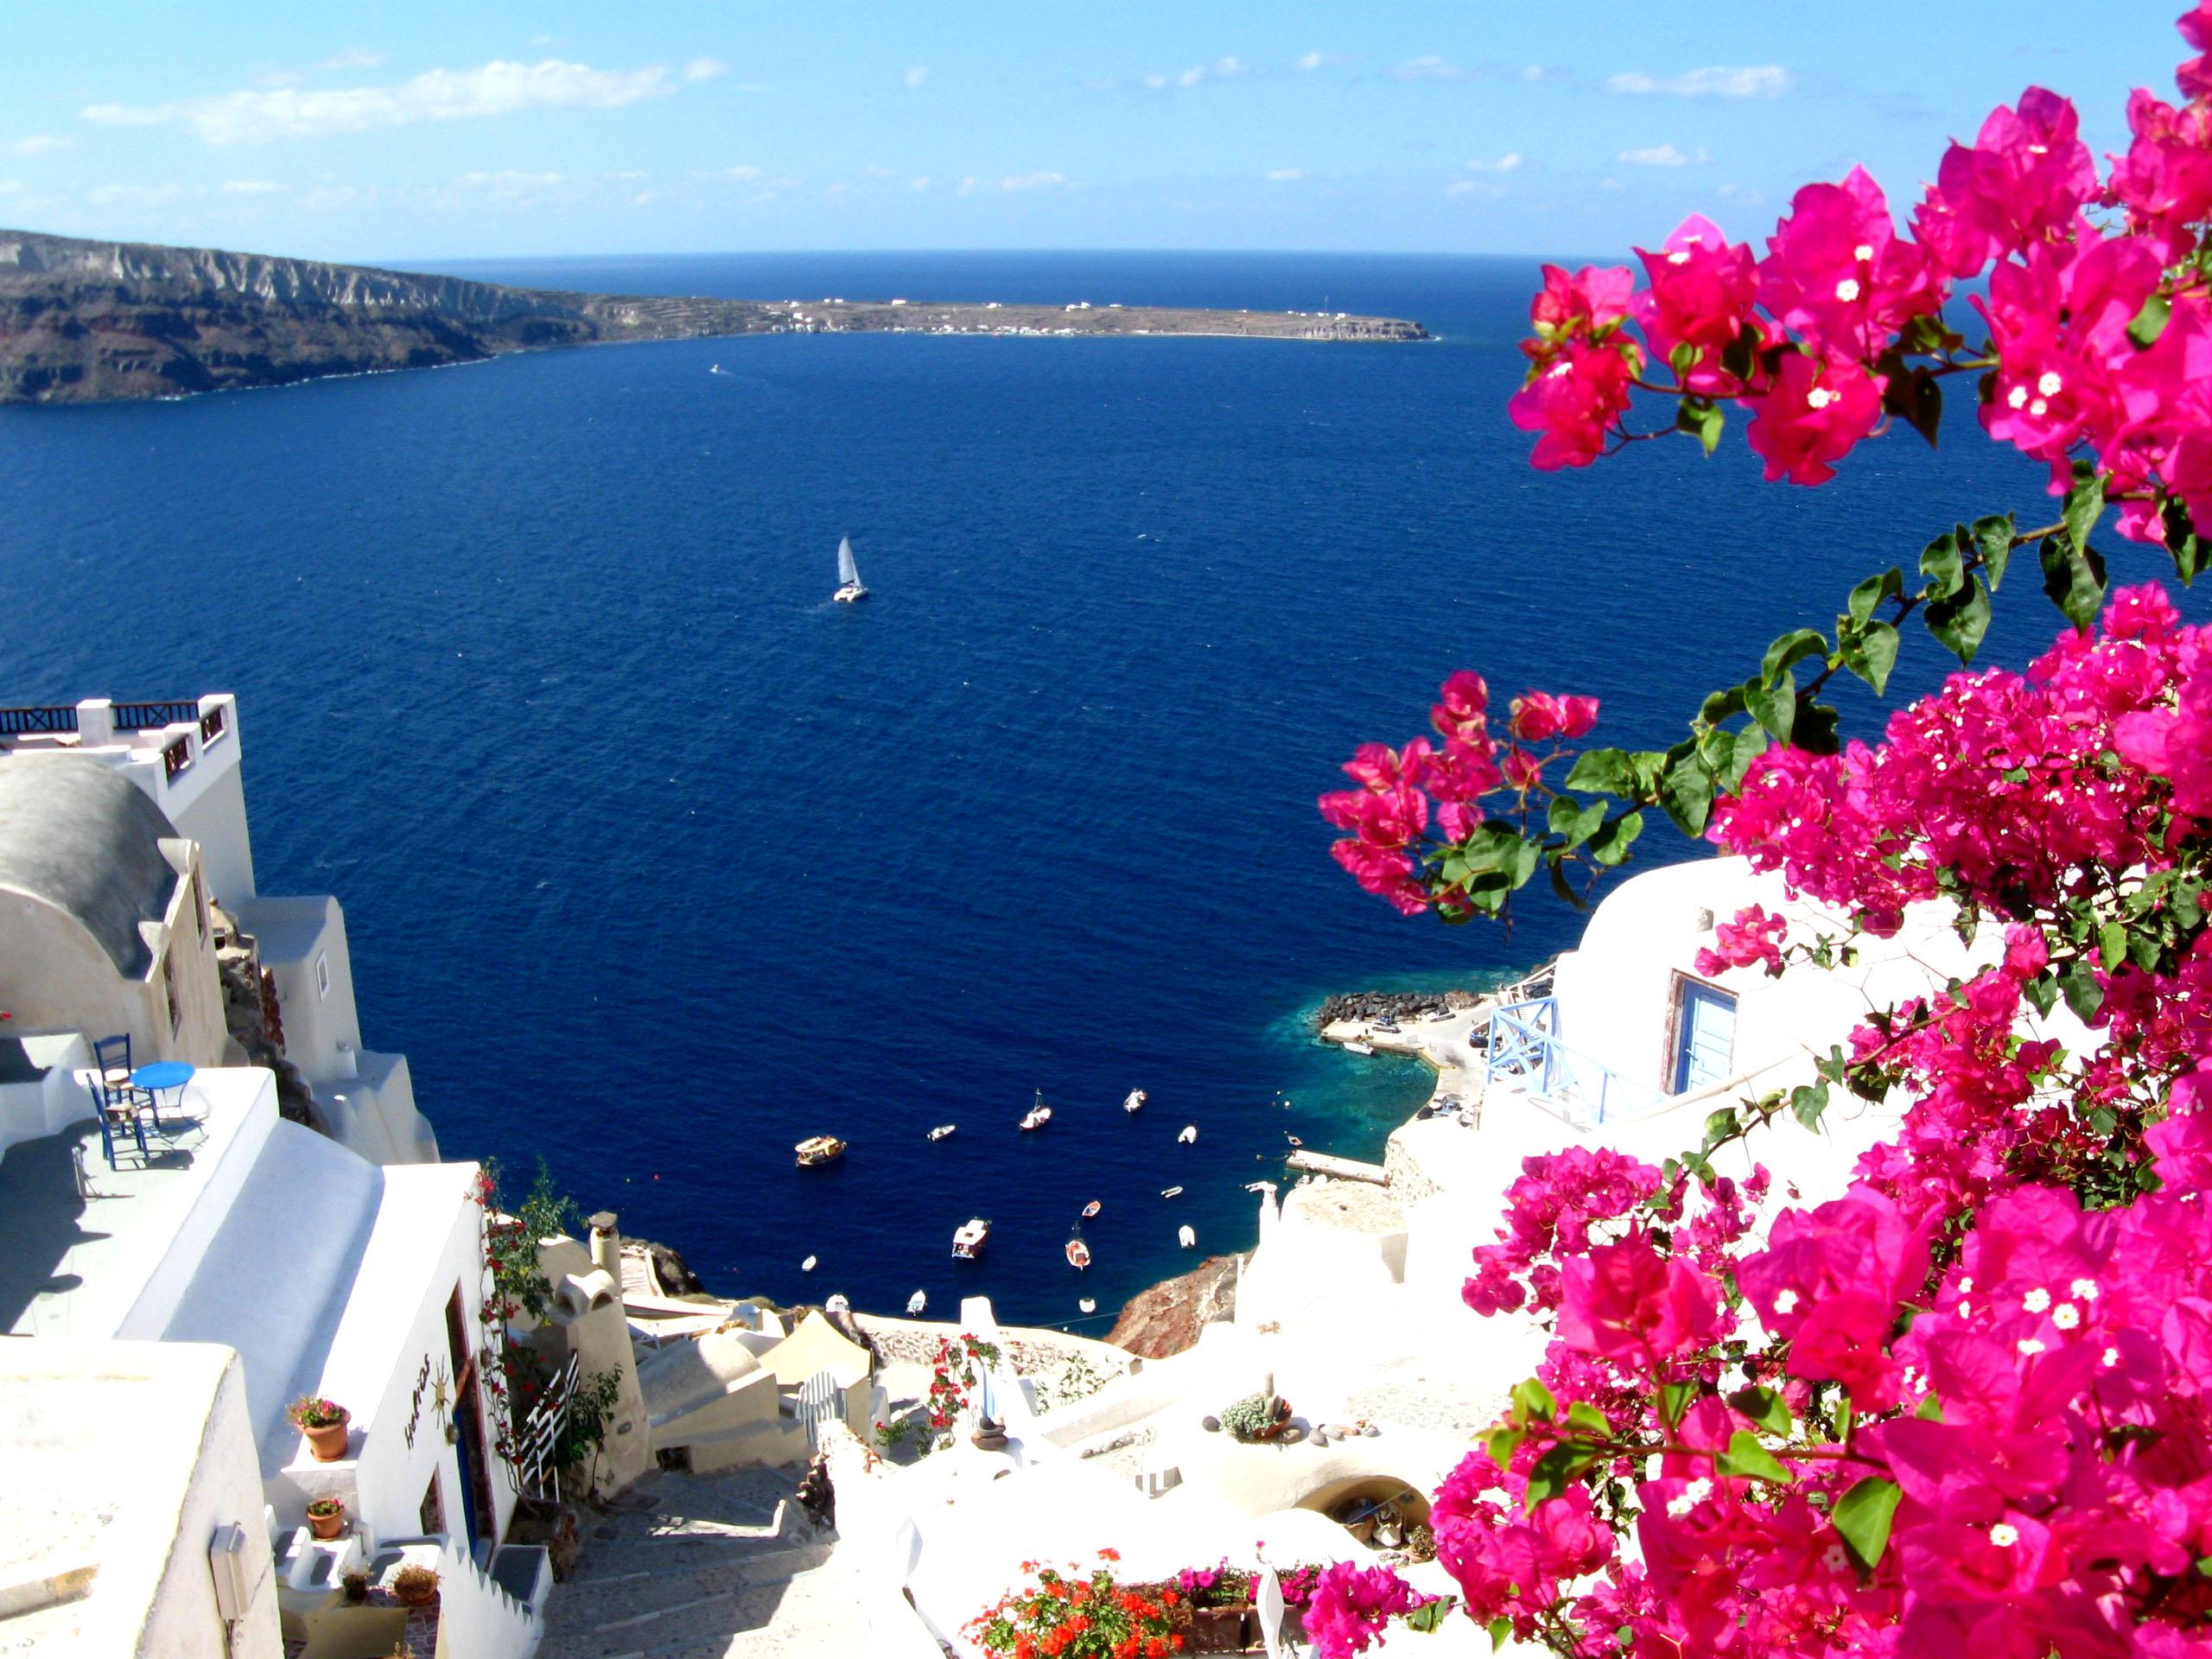 wallpaper santorini greece island - photo #18